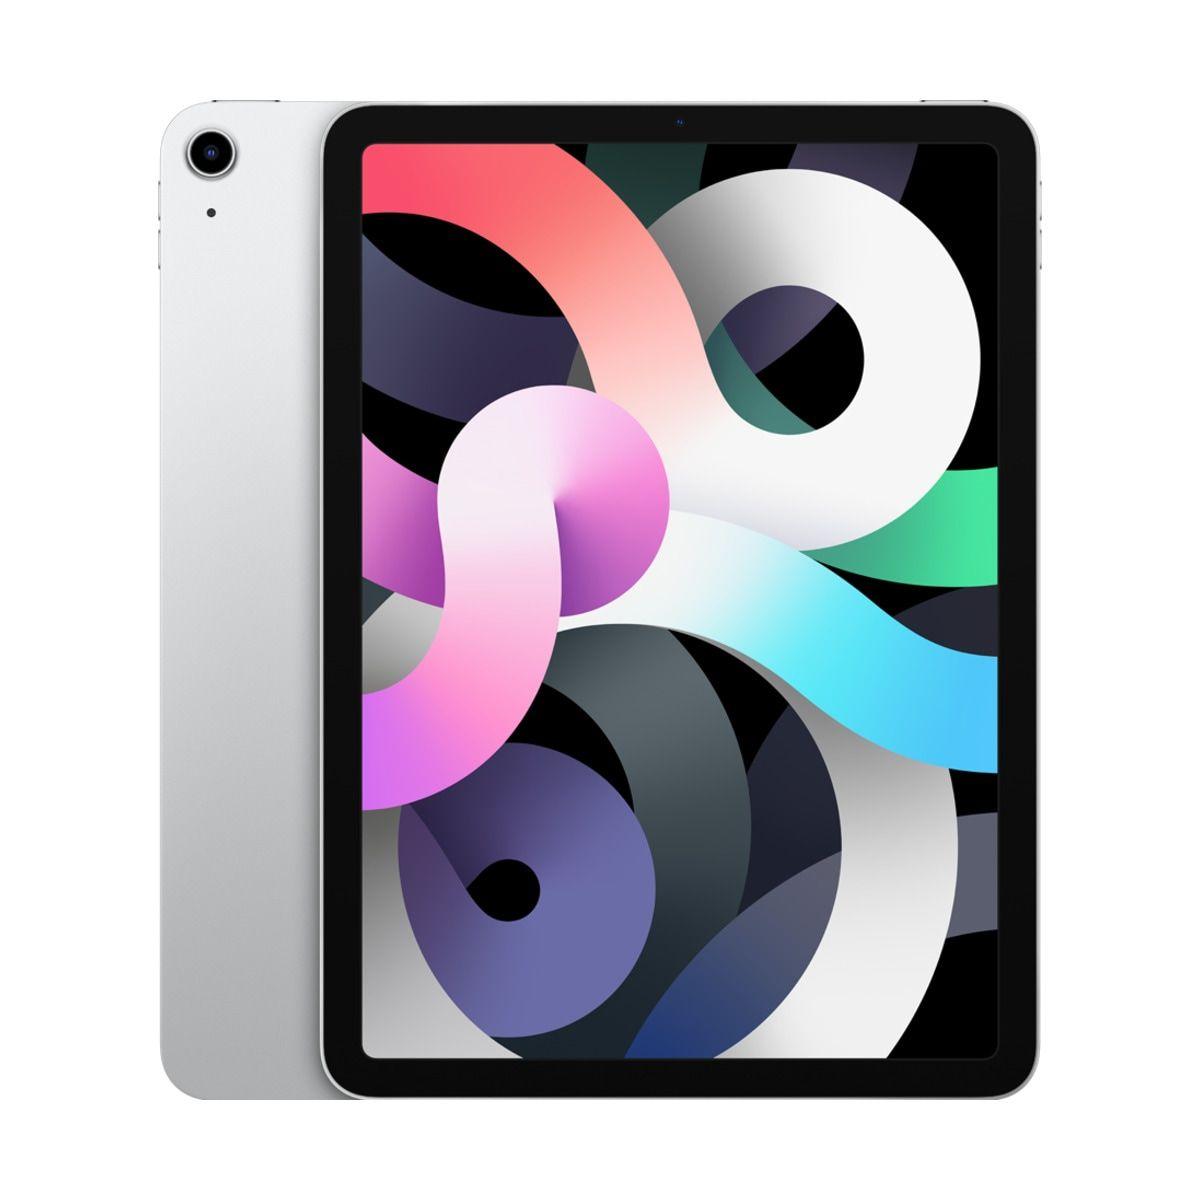 Apple iPad Air Wi-Fi + Cell 256GB - Silver / SK